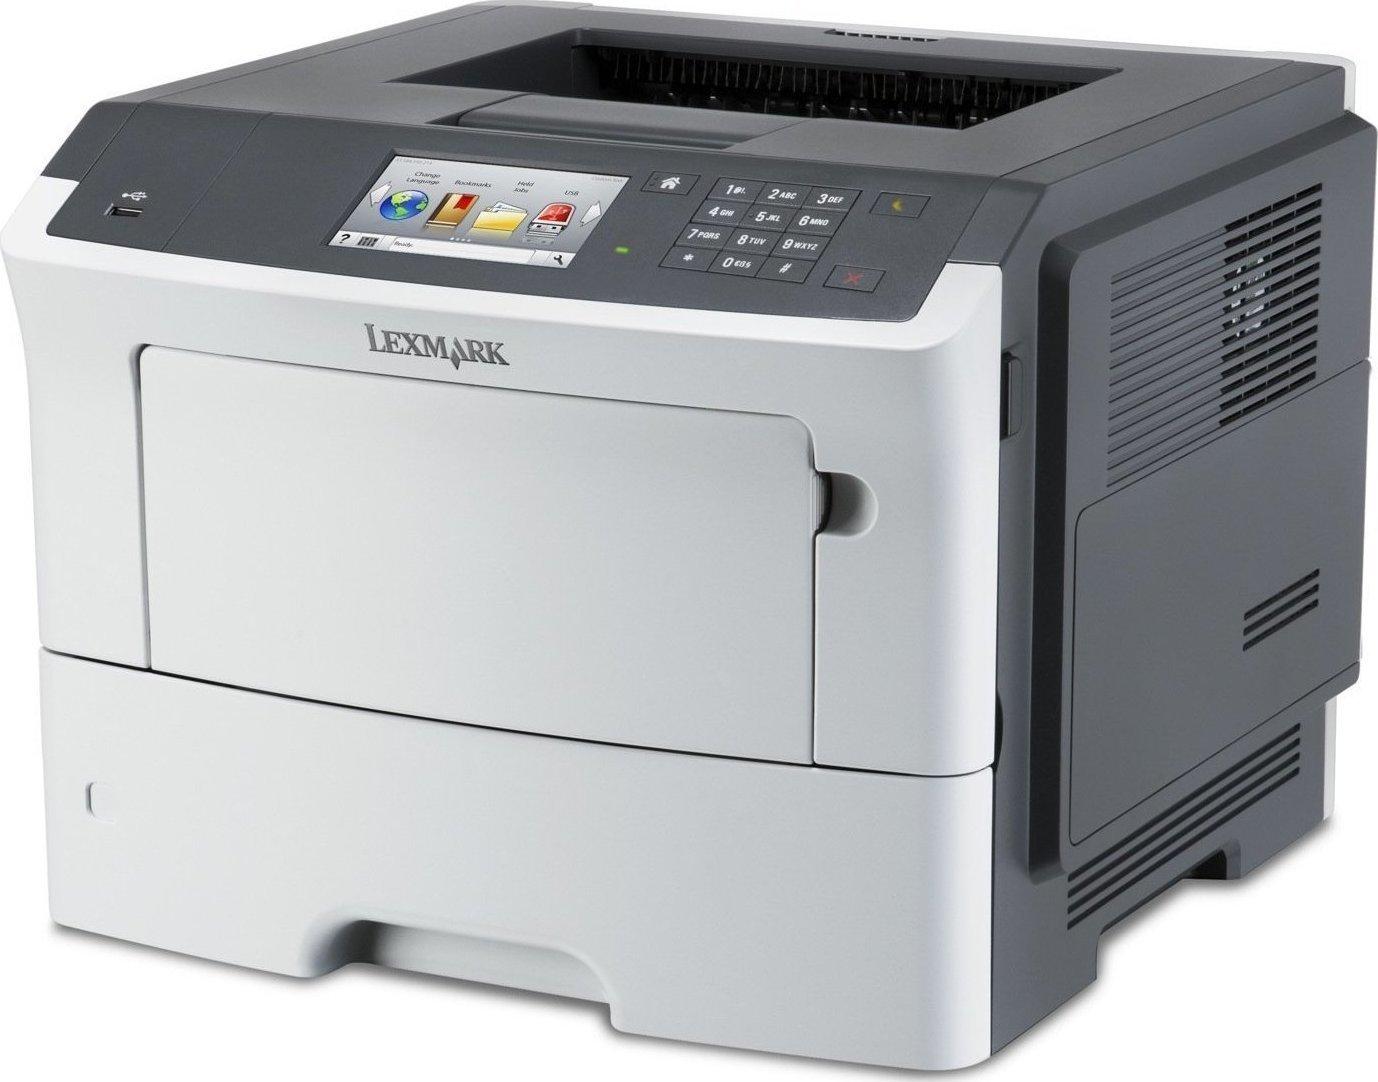 Lexmark Ms610de Refurbished (47 σελ/λεπτό) ΜΕ FULL TONER 10.000 ΣΕΛΙΔΩΝ